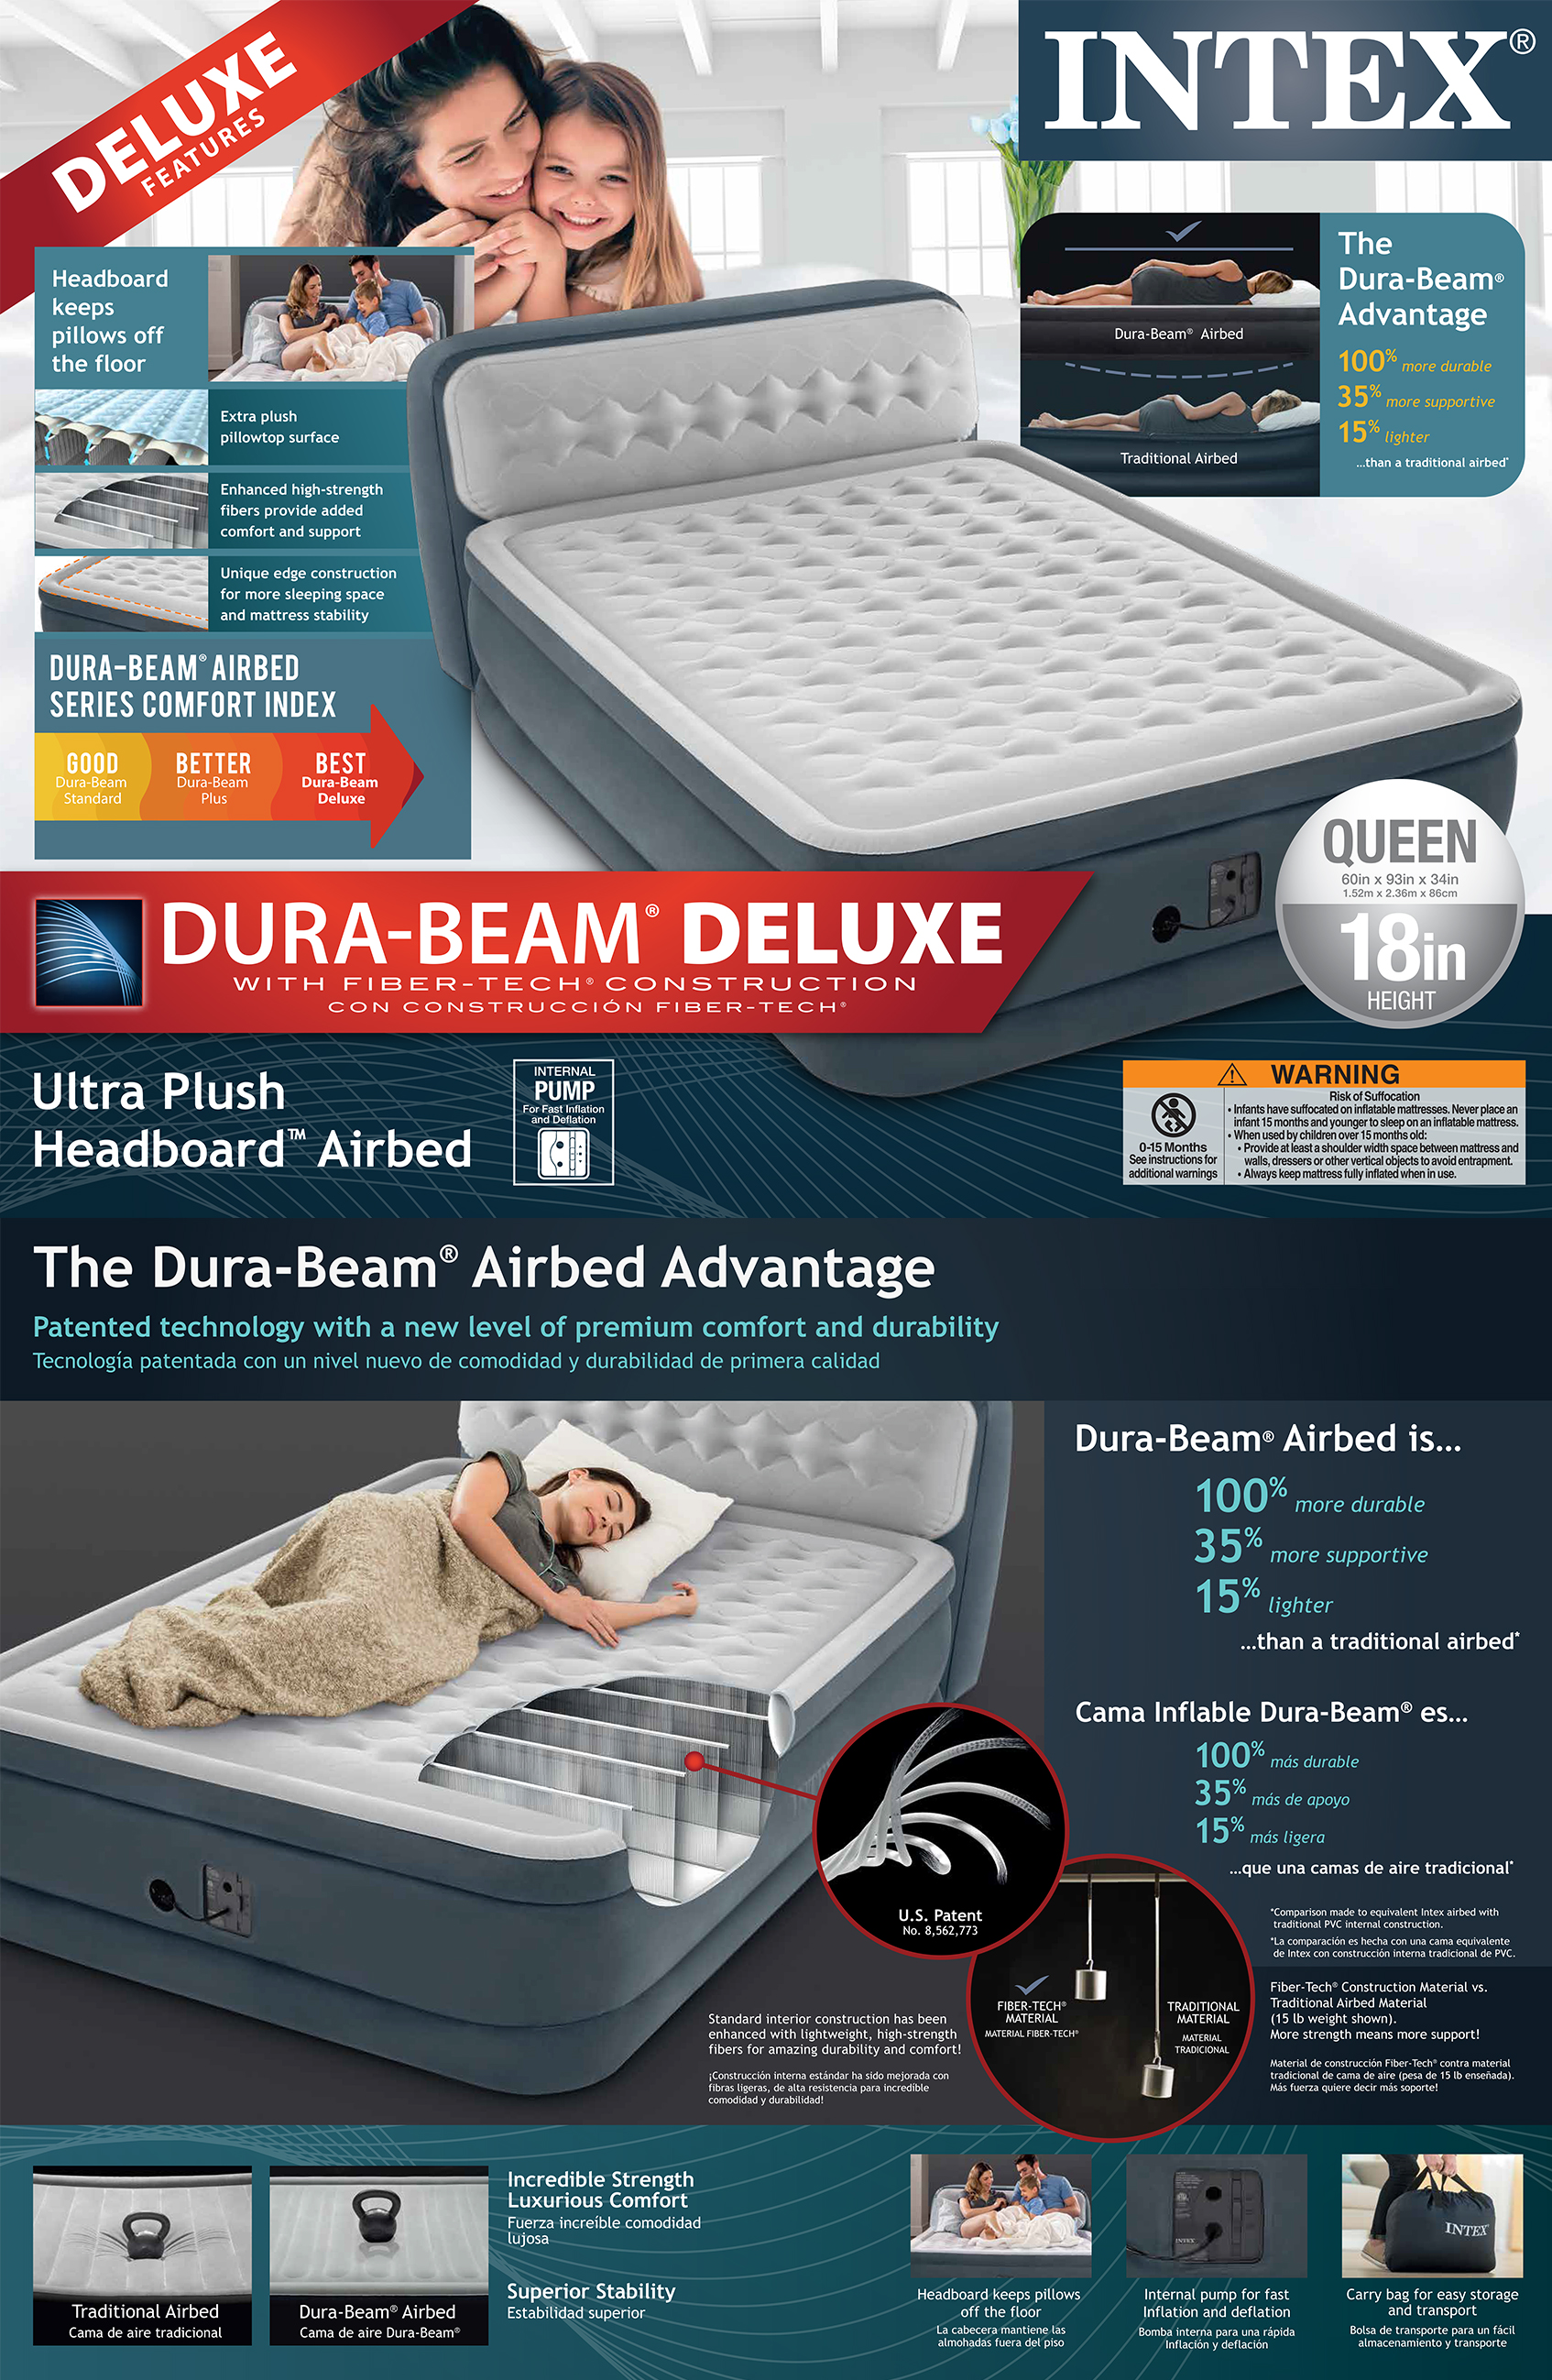 18in Queen Dura-Beam Ultra Plush Headboard Airbed with Internal Pump